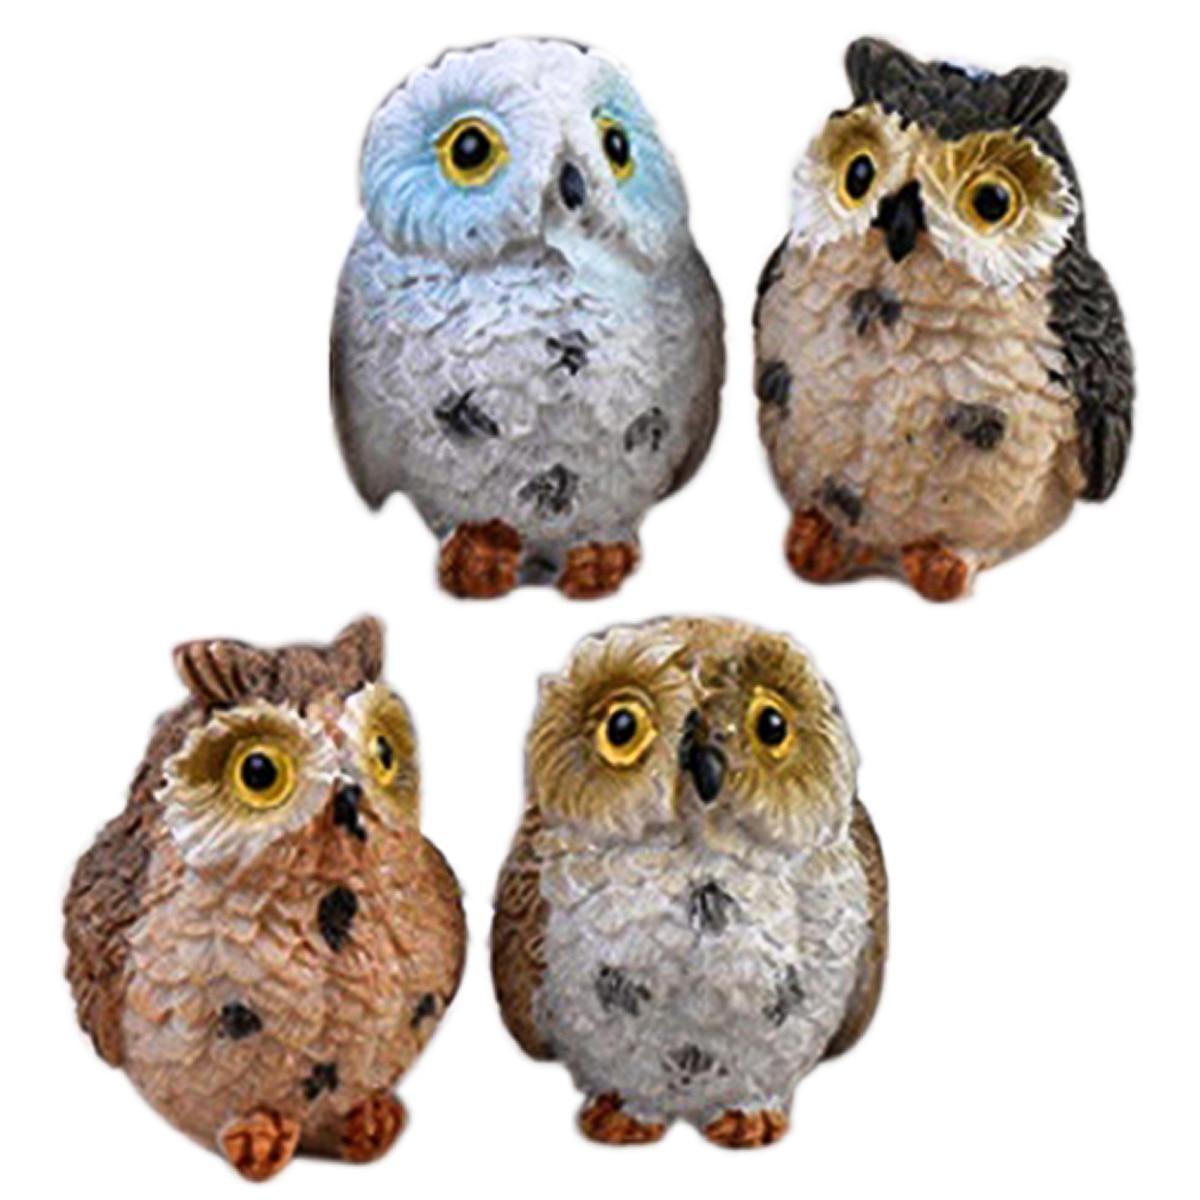 Resin Landscape Owl Doll Resin Fairy Home Garden DIY Decor Micro Ornaments Decoration